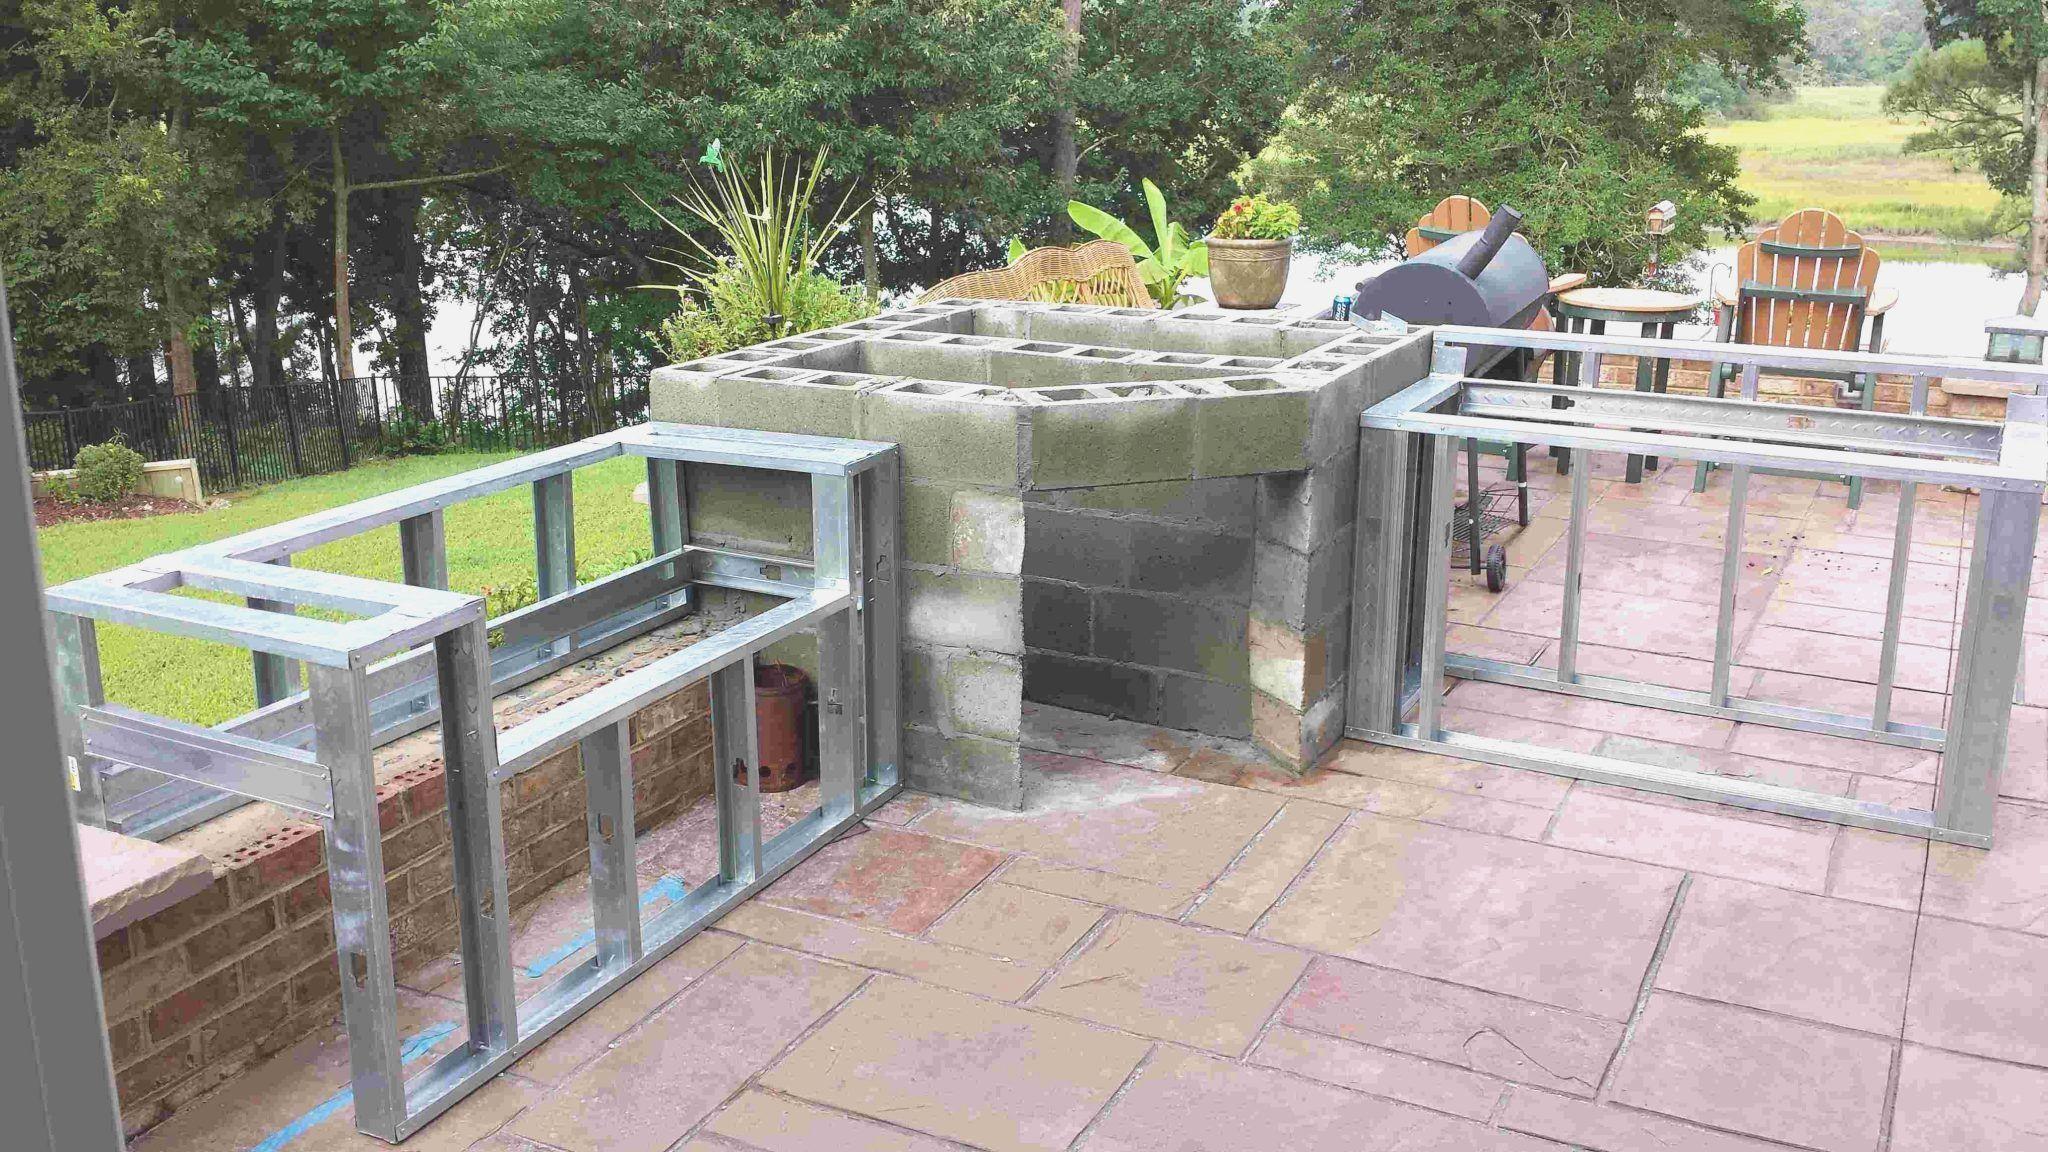 outdoor kitchen island frame kit - 6 ft outdoor kitchen island frame